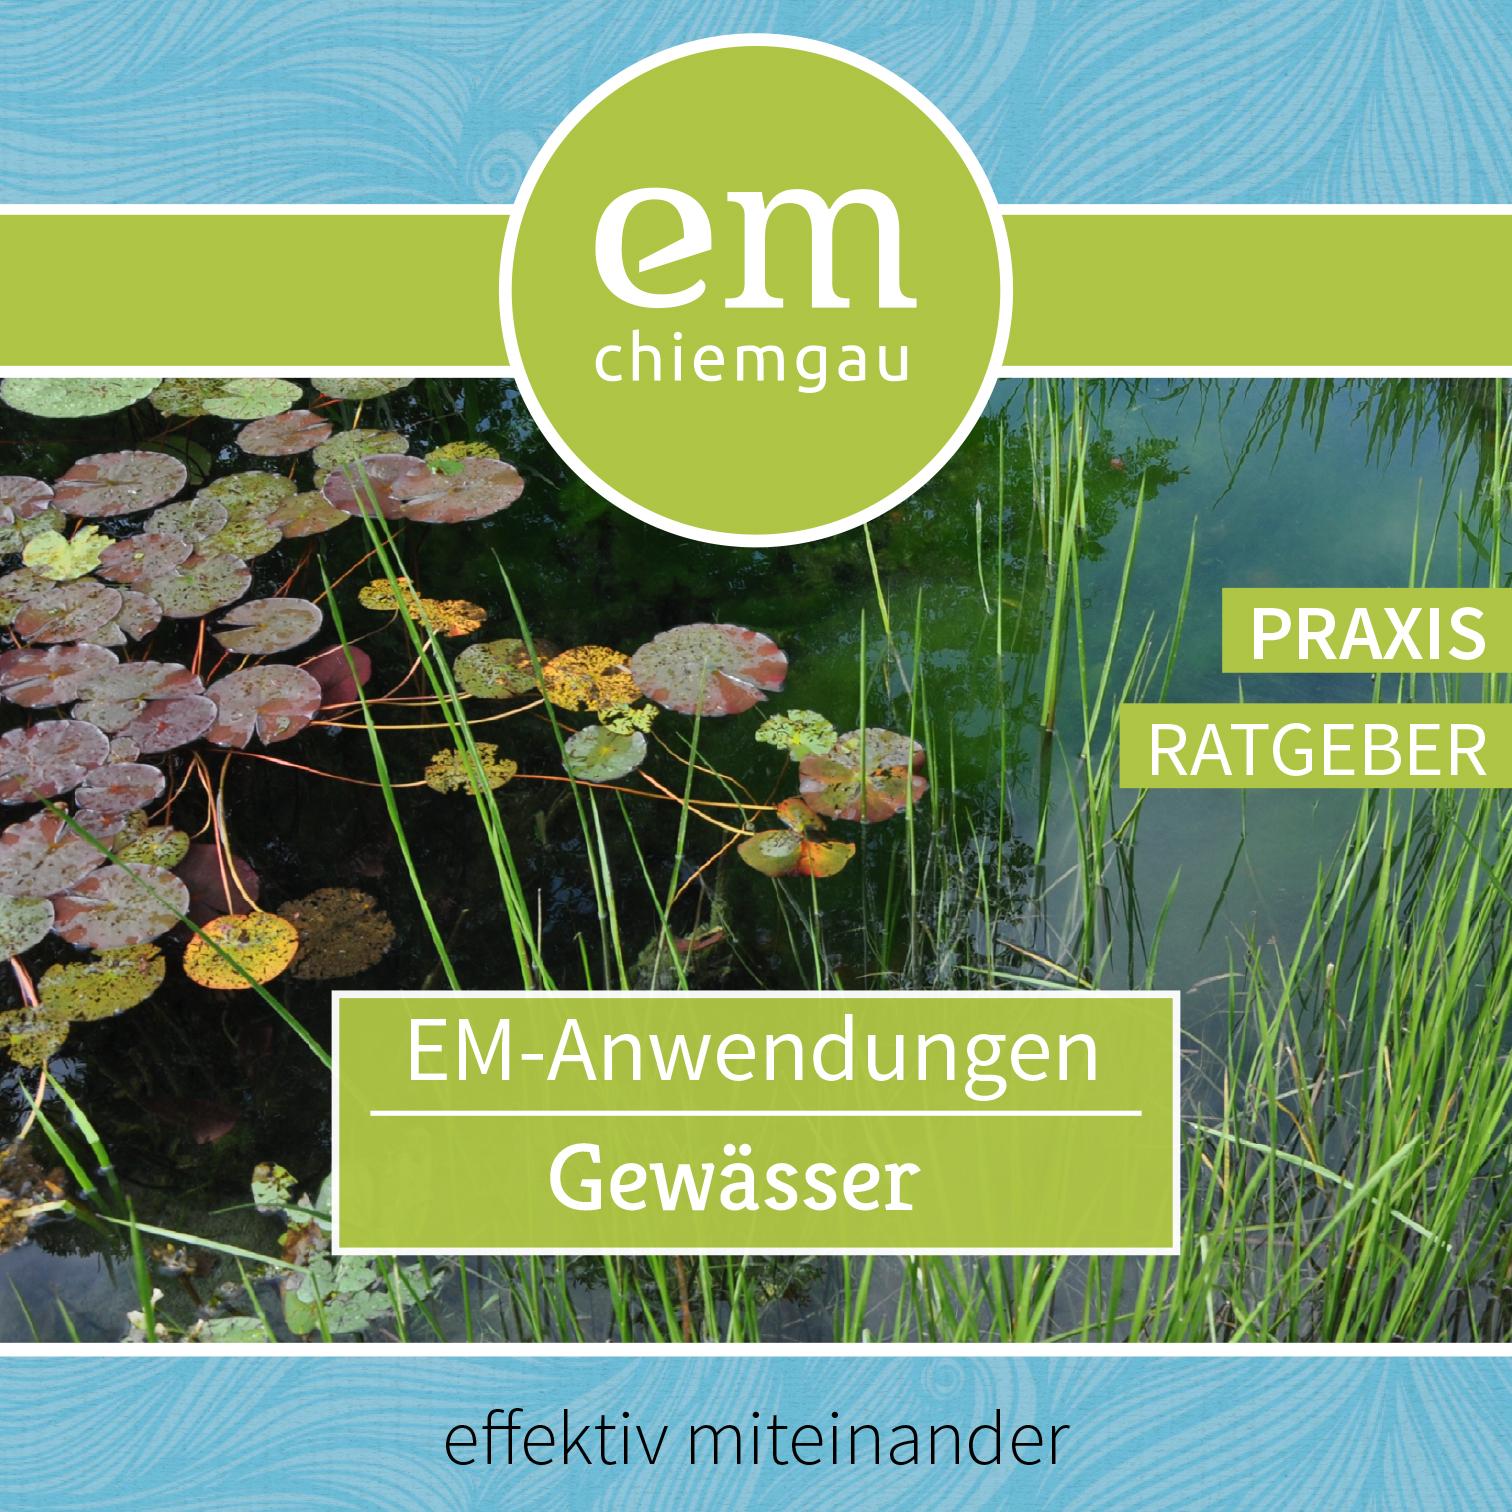 AC-Umwelttechnik – Effektive Mikroorganismen b. Gewässer